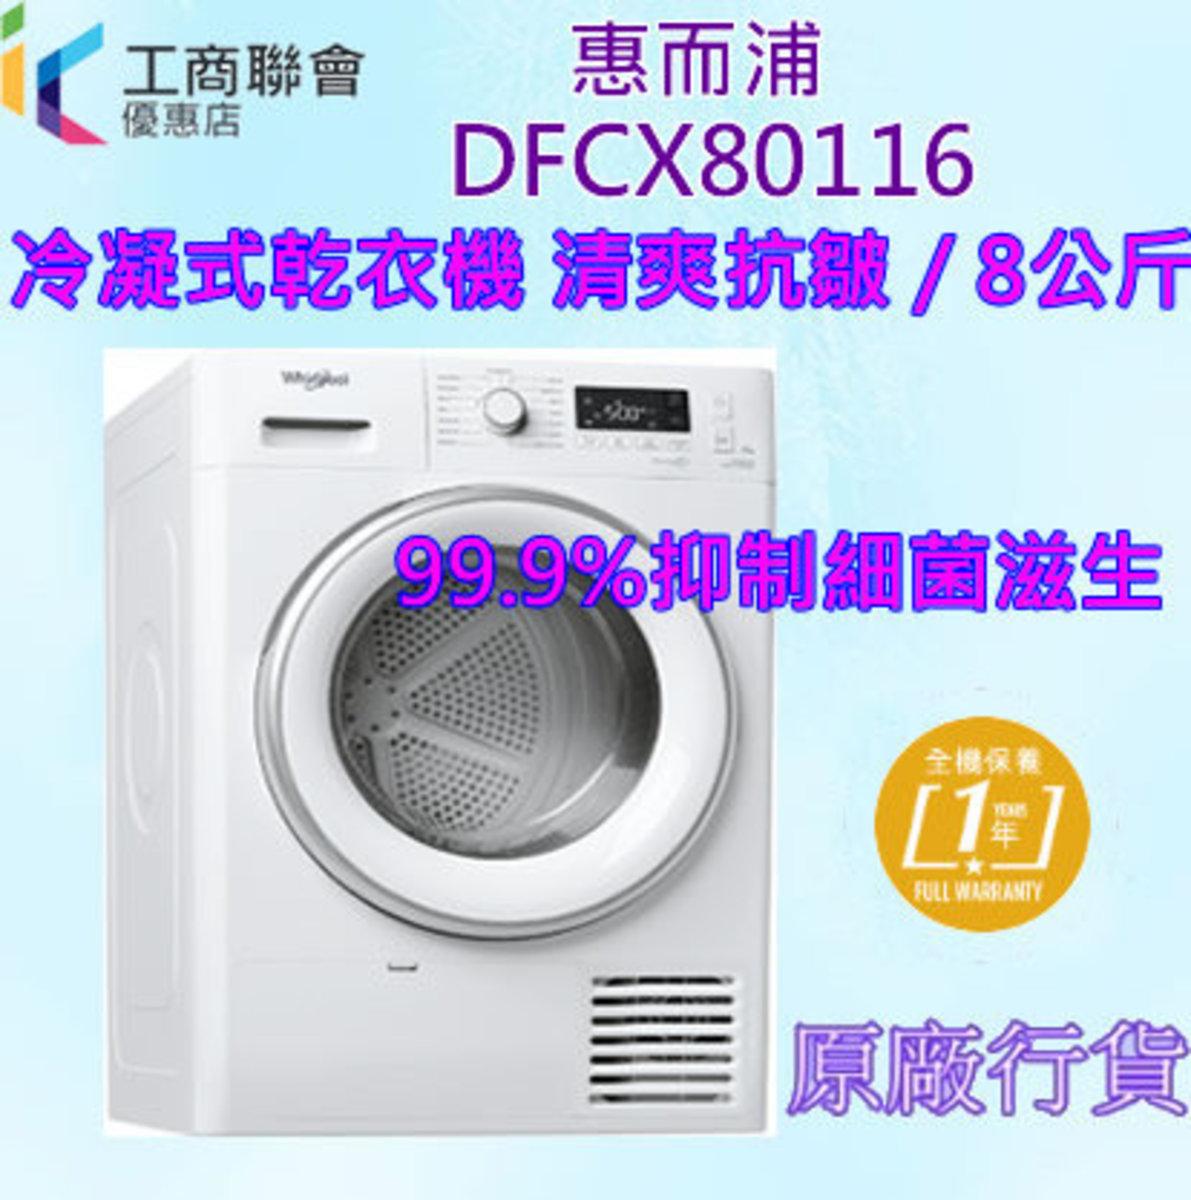 DFCX80116 冷凝式乾衣機